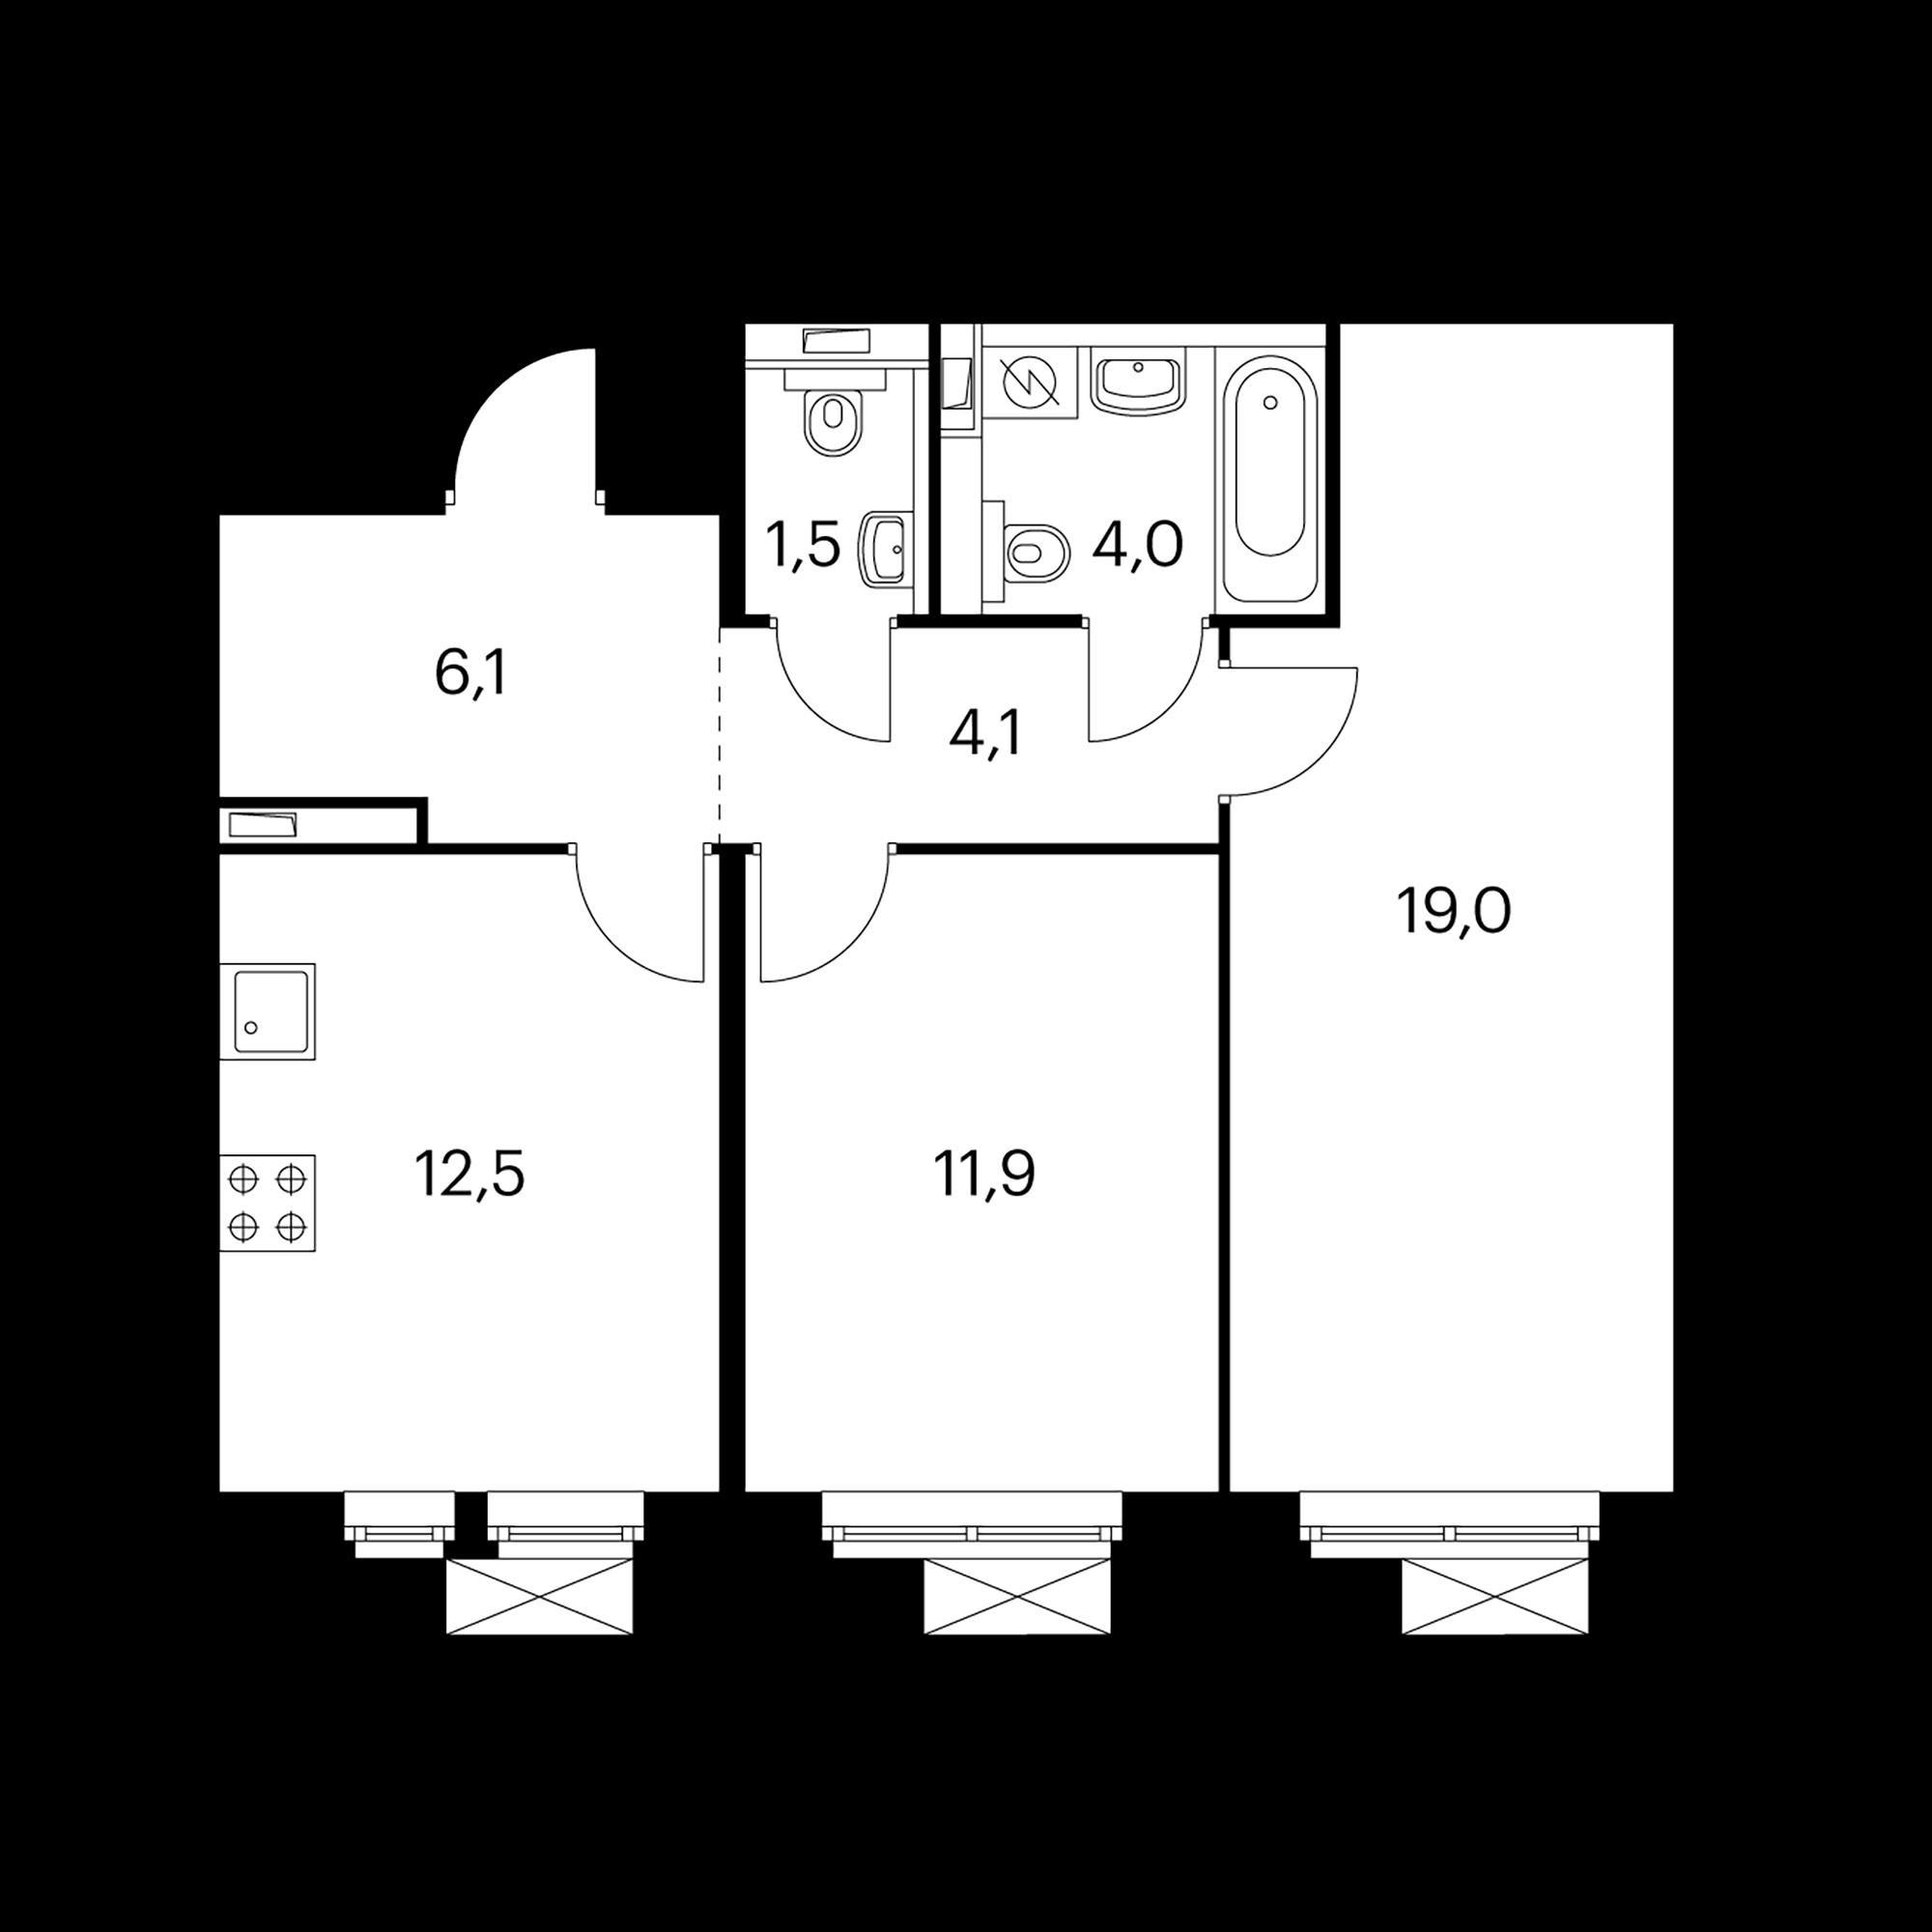 2KM4_9.3-6